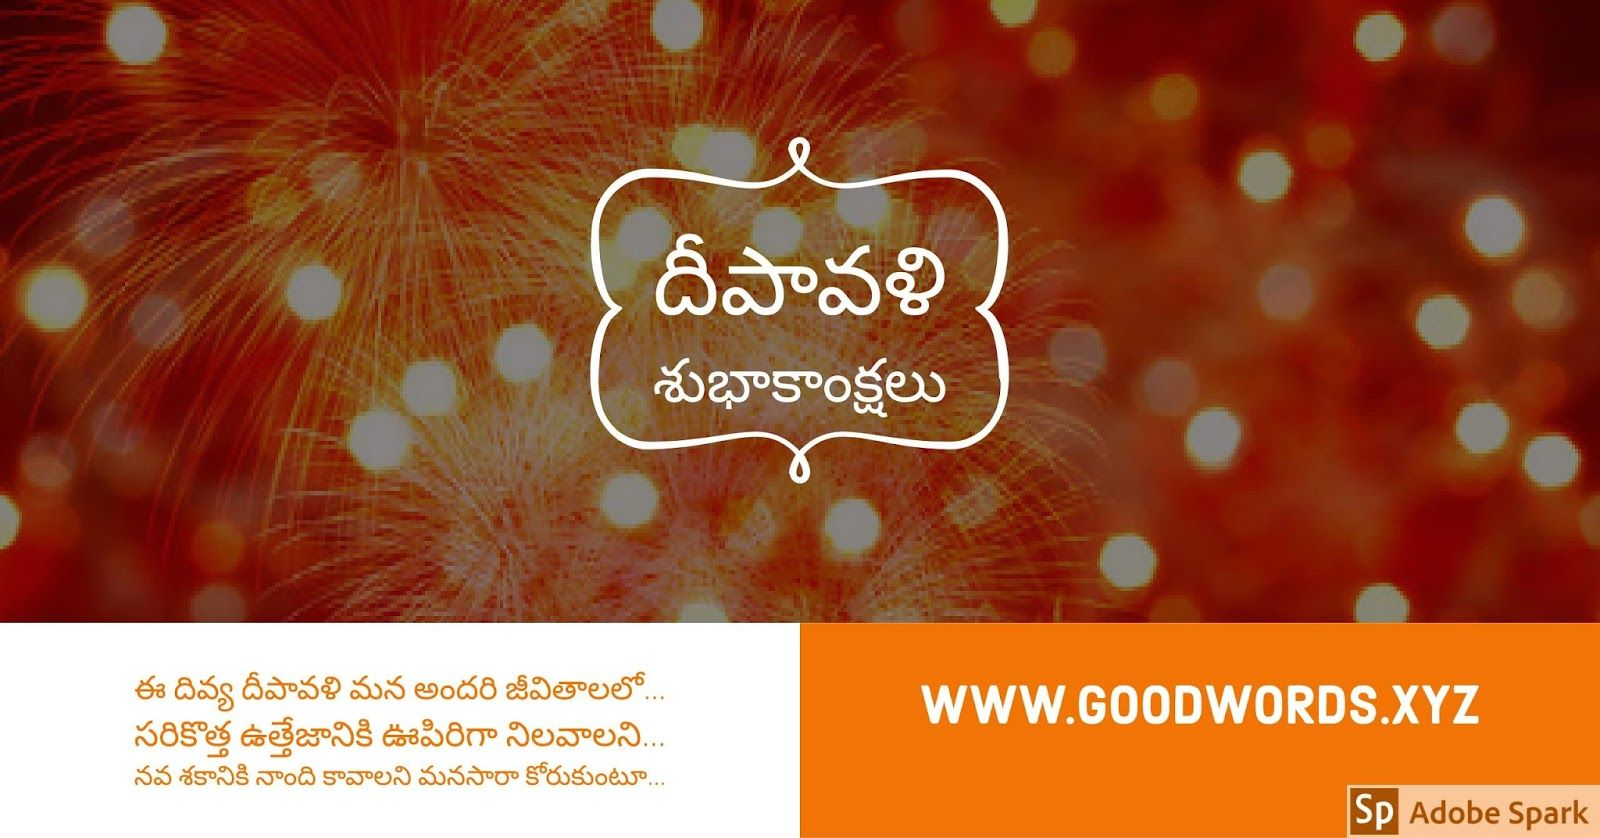 Latest Diwali Smart Wishes In Telugu Good Words Xyz Pinterest